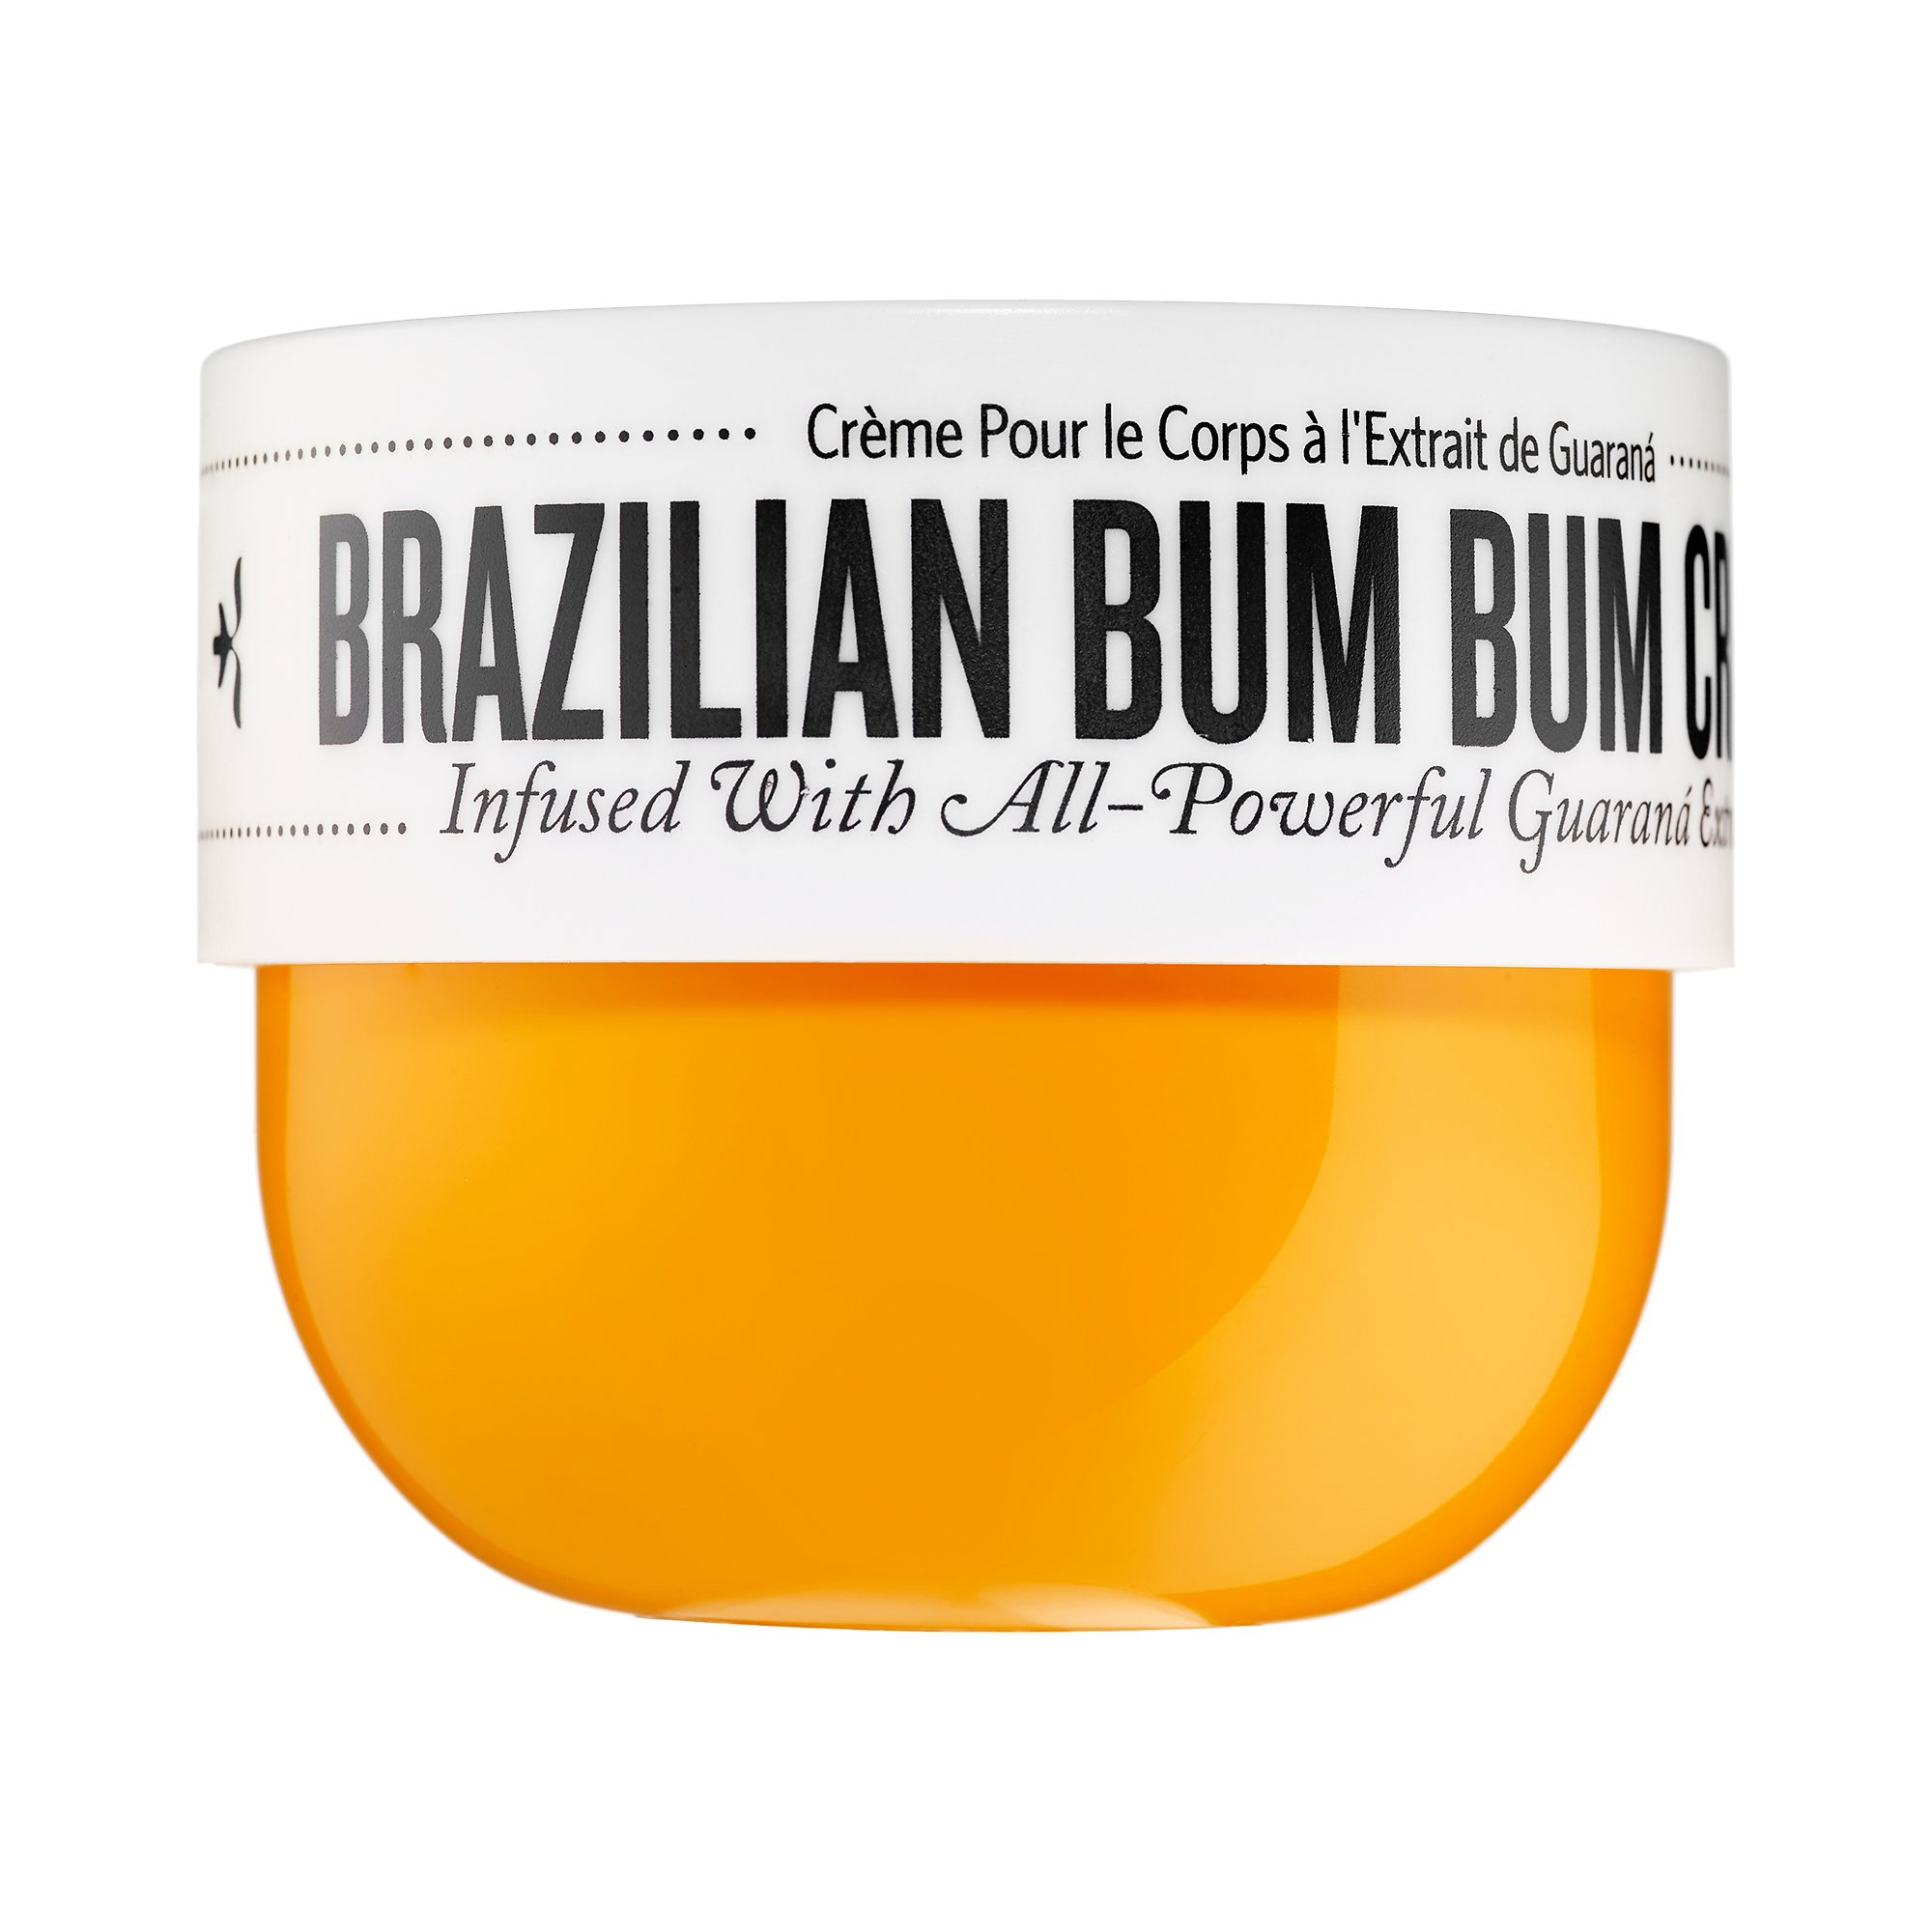 Brazilian Bum Bum Cream 8.1 oz